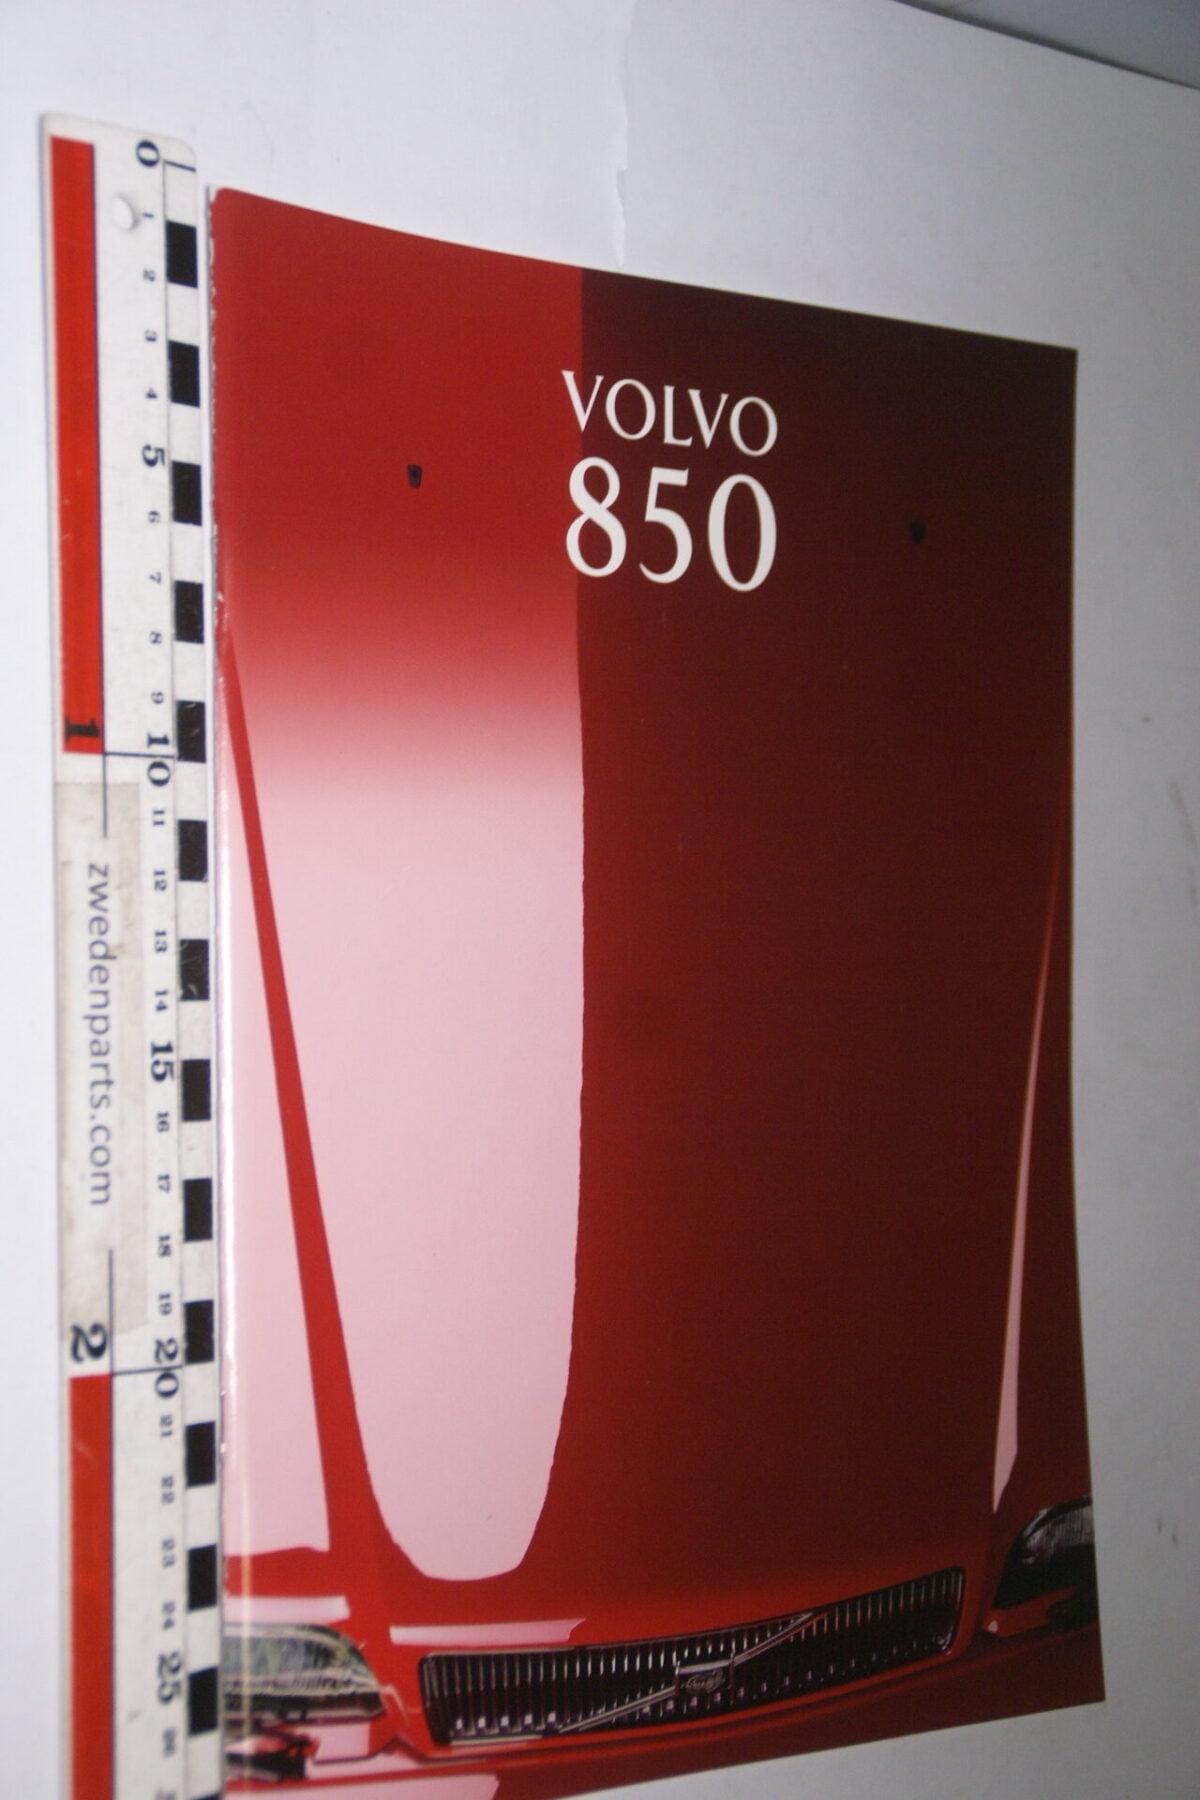 DSC05296 1993 originele brochure Volvo 850 nr MSPV 5615-a97b83b4